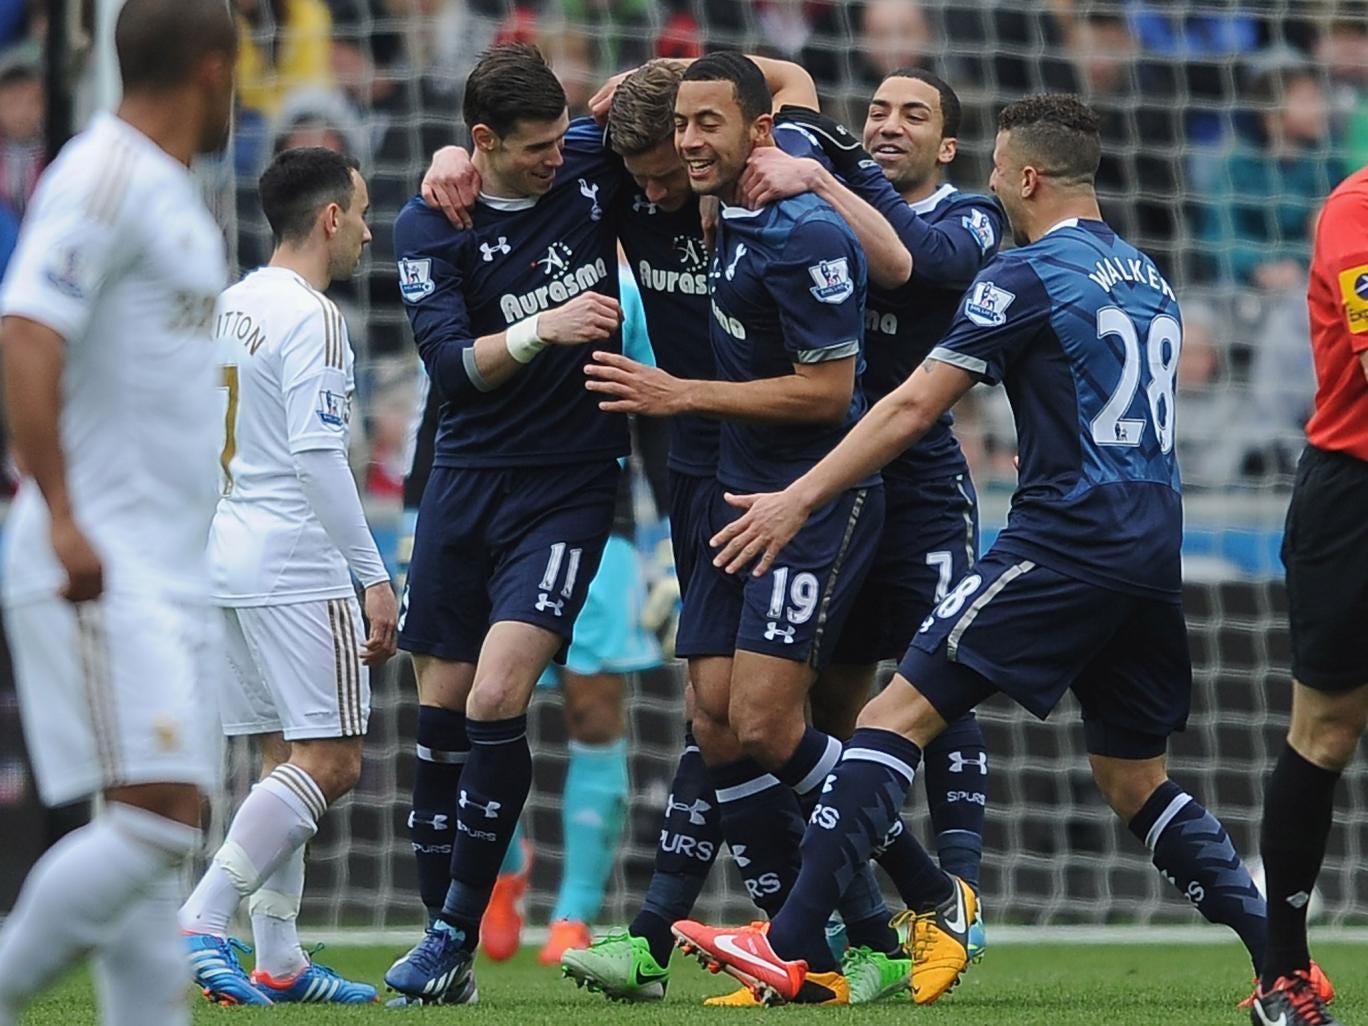 Jan Vertonghen of Tottenham celebrates with team-mates after scoring their first goal